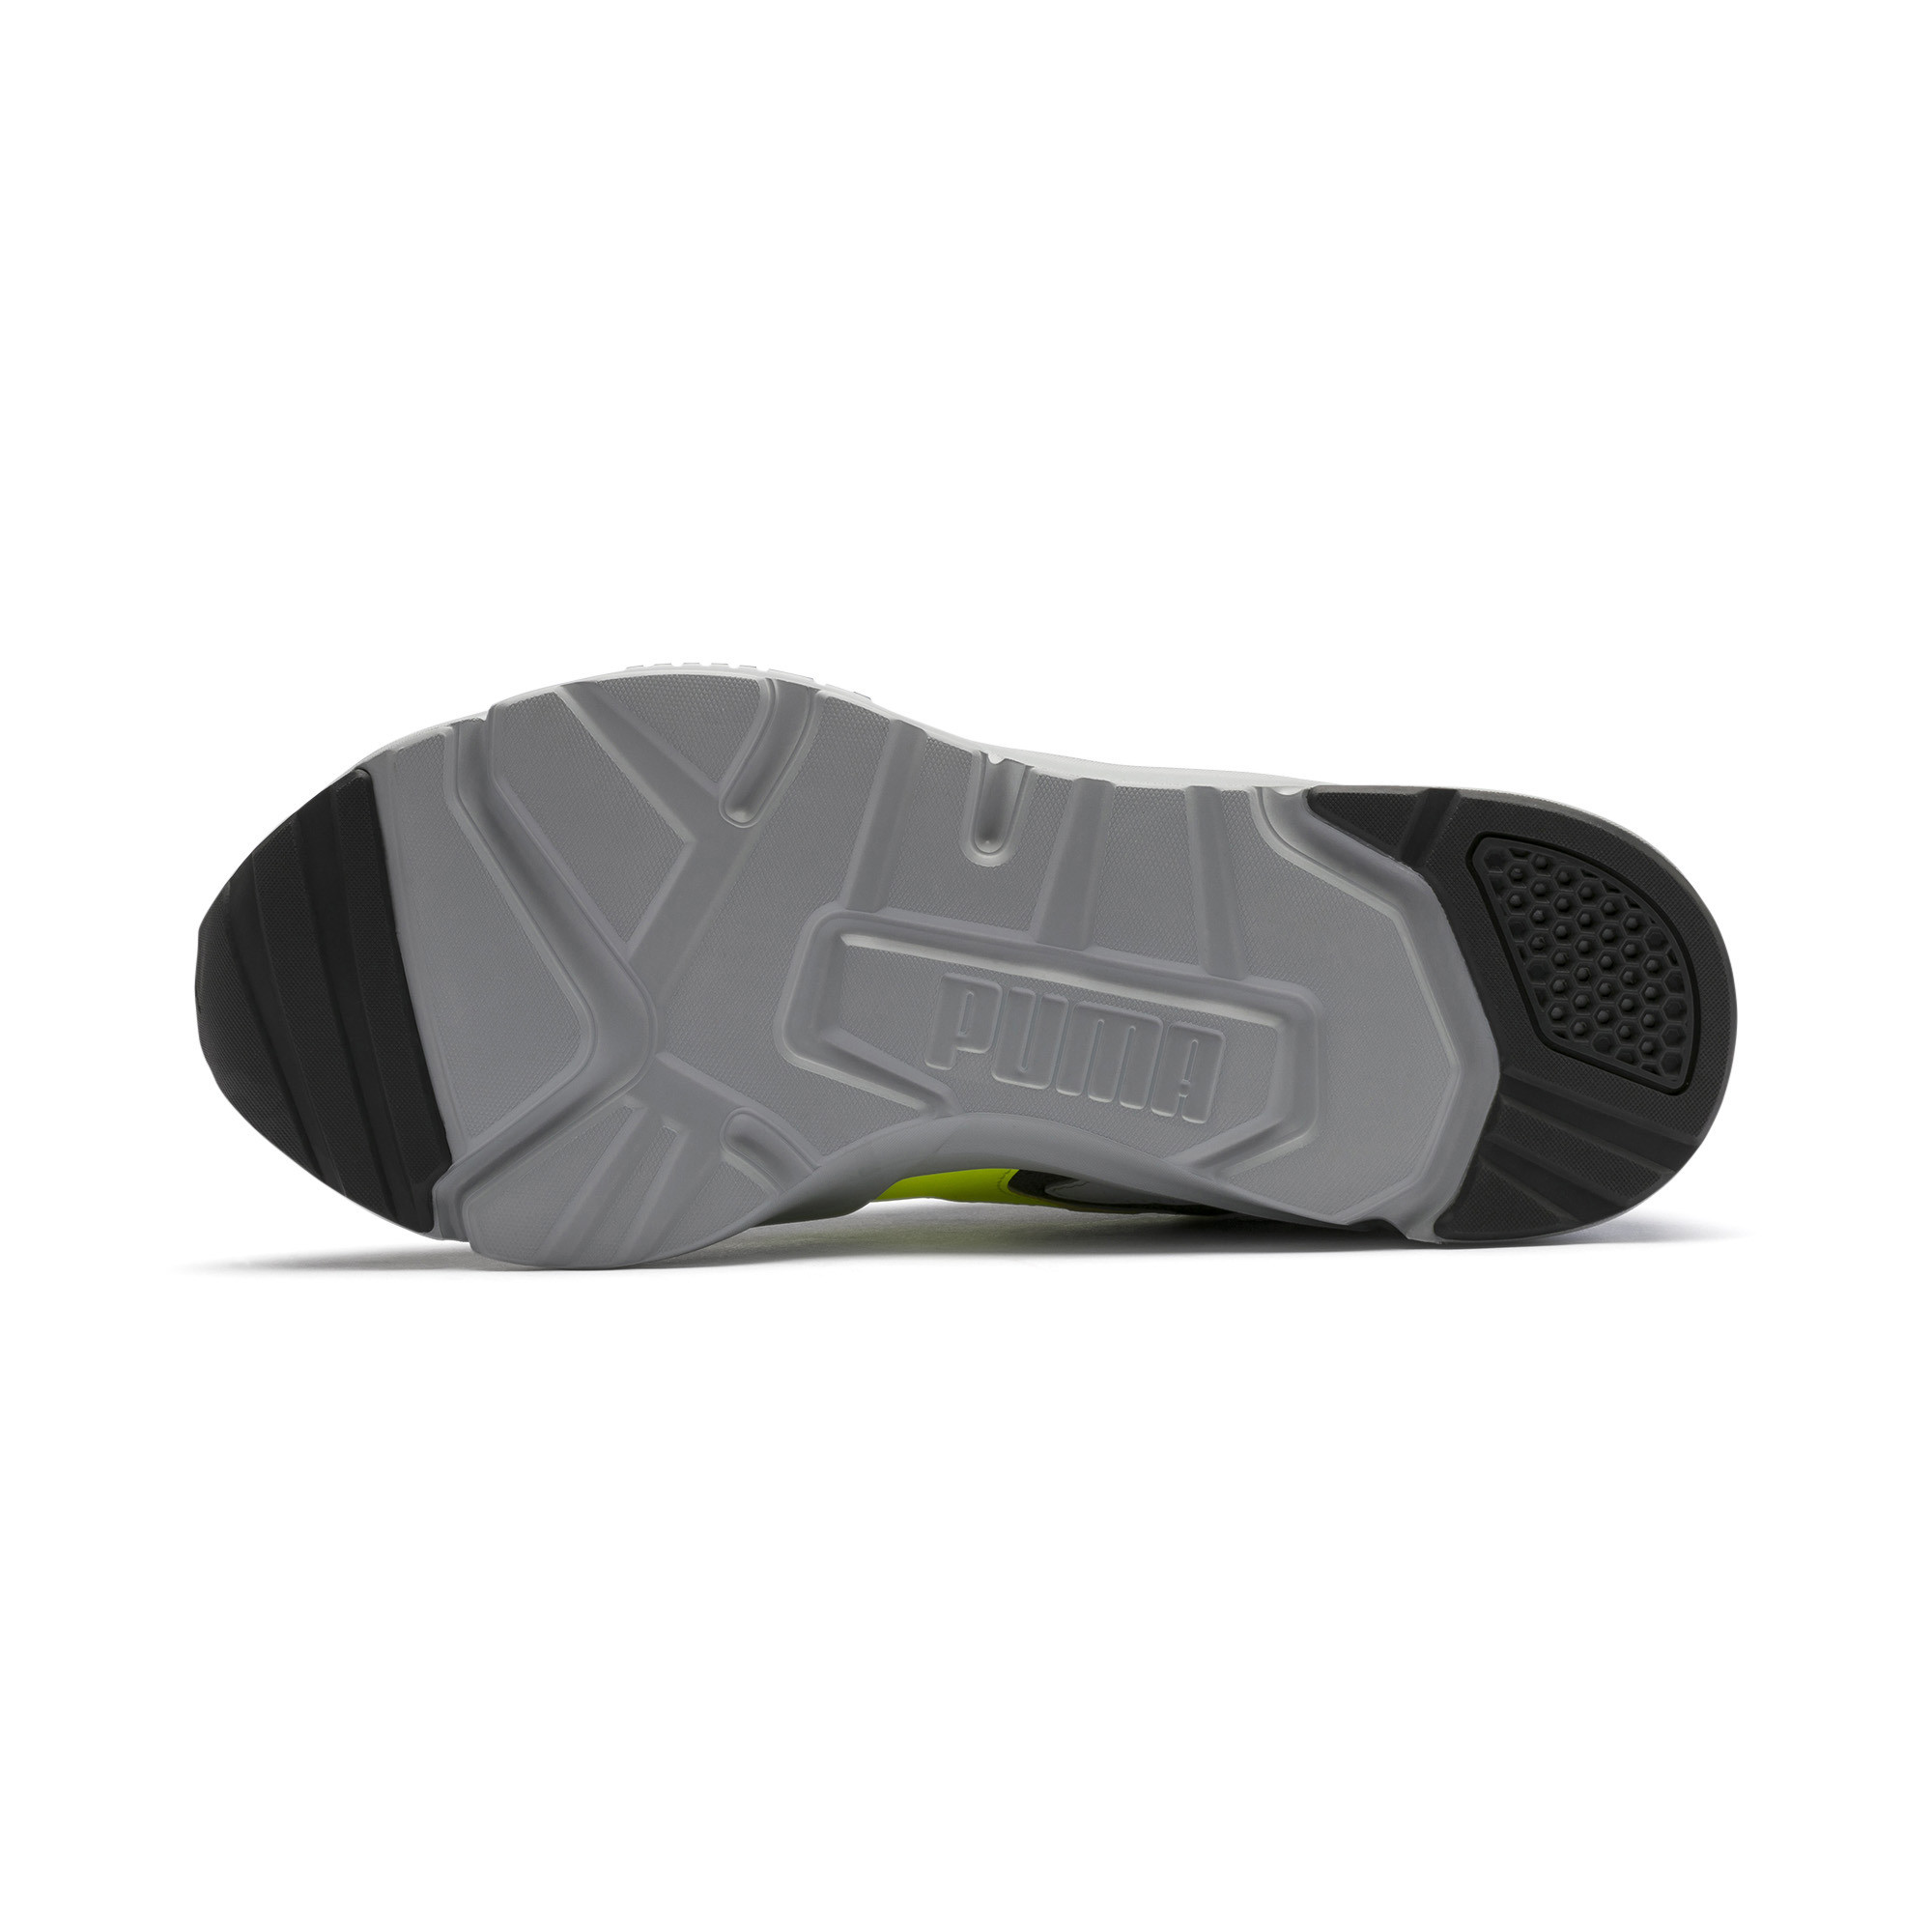 PUMA-Men-039-s-CELL-Pharos-Training-Shoes thumbnail 9